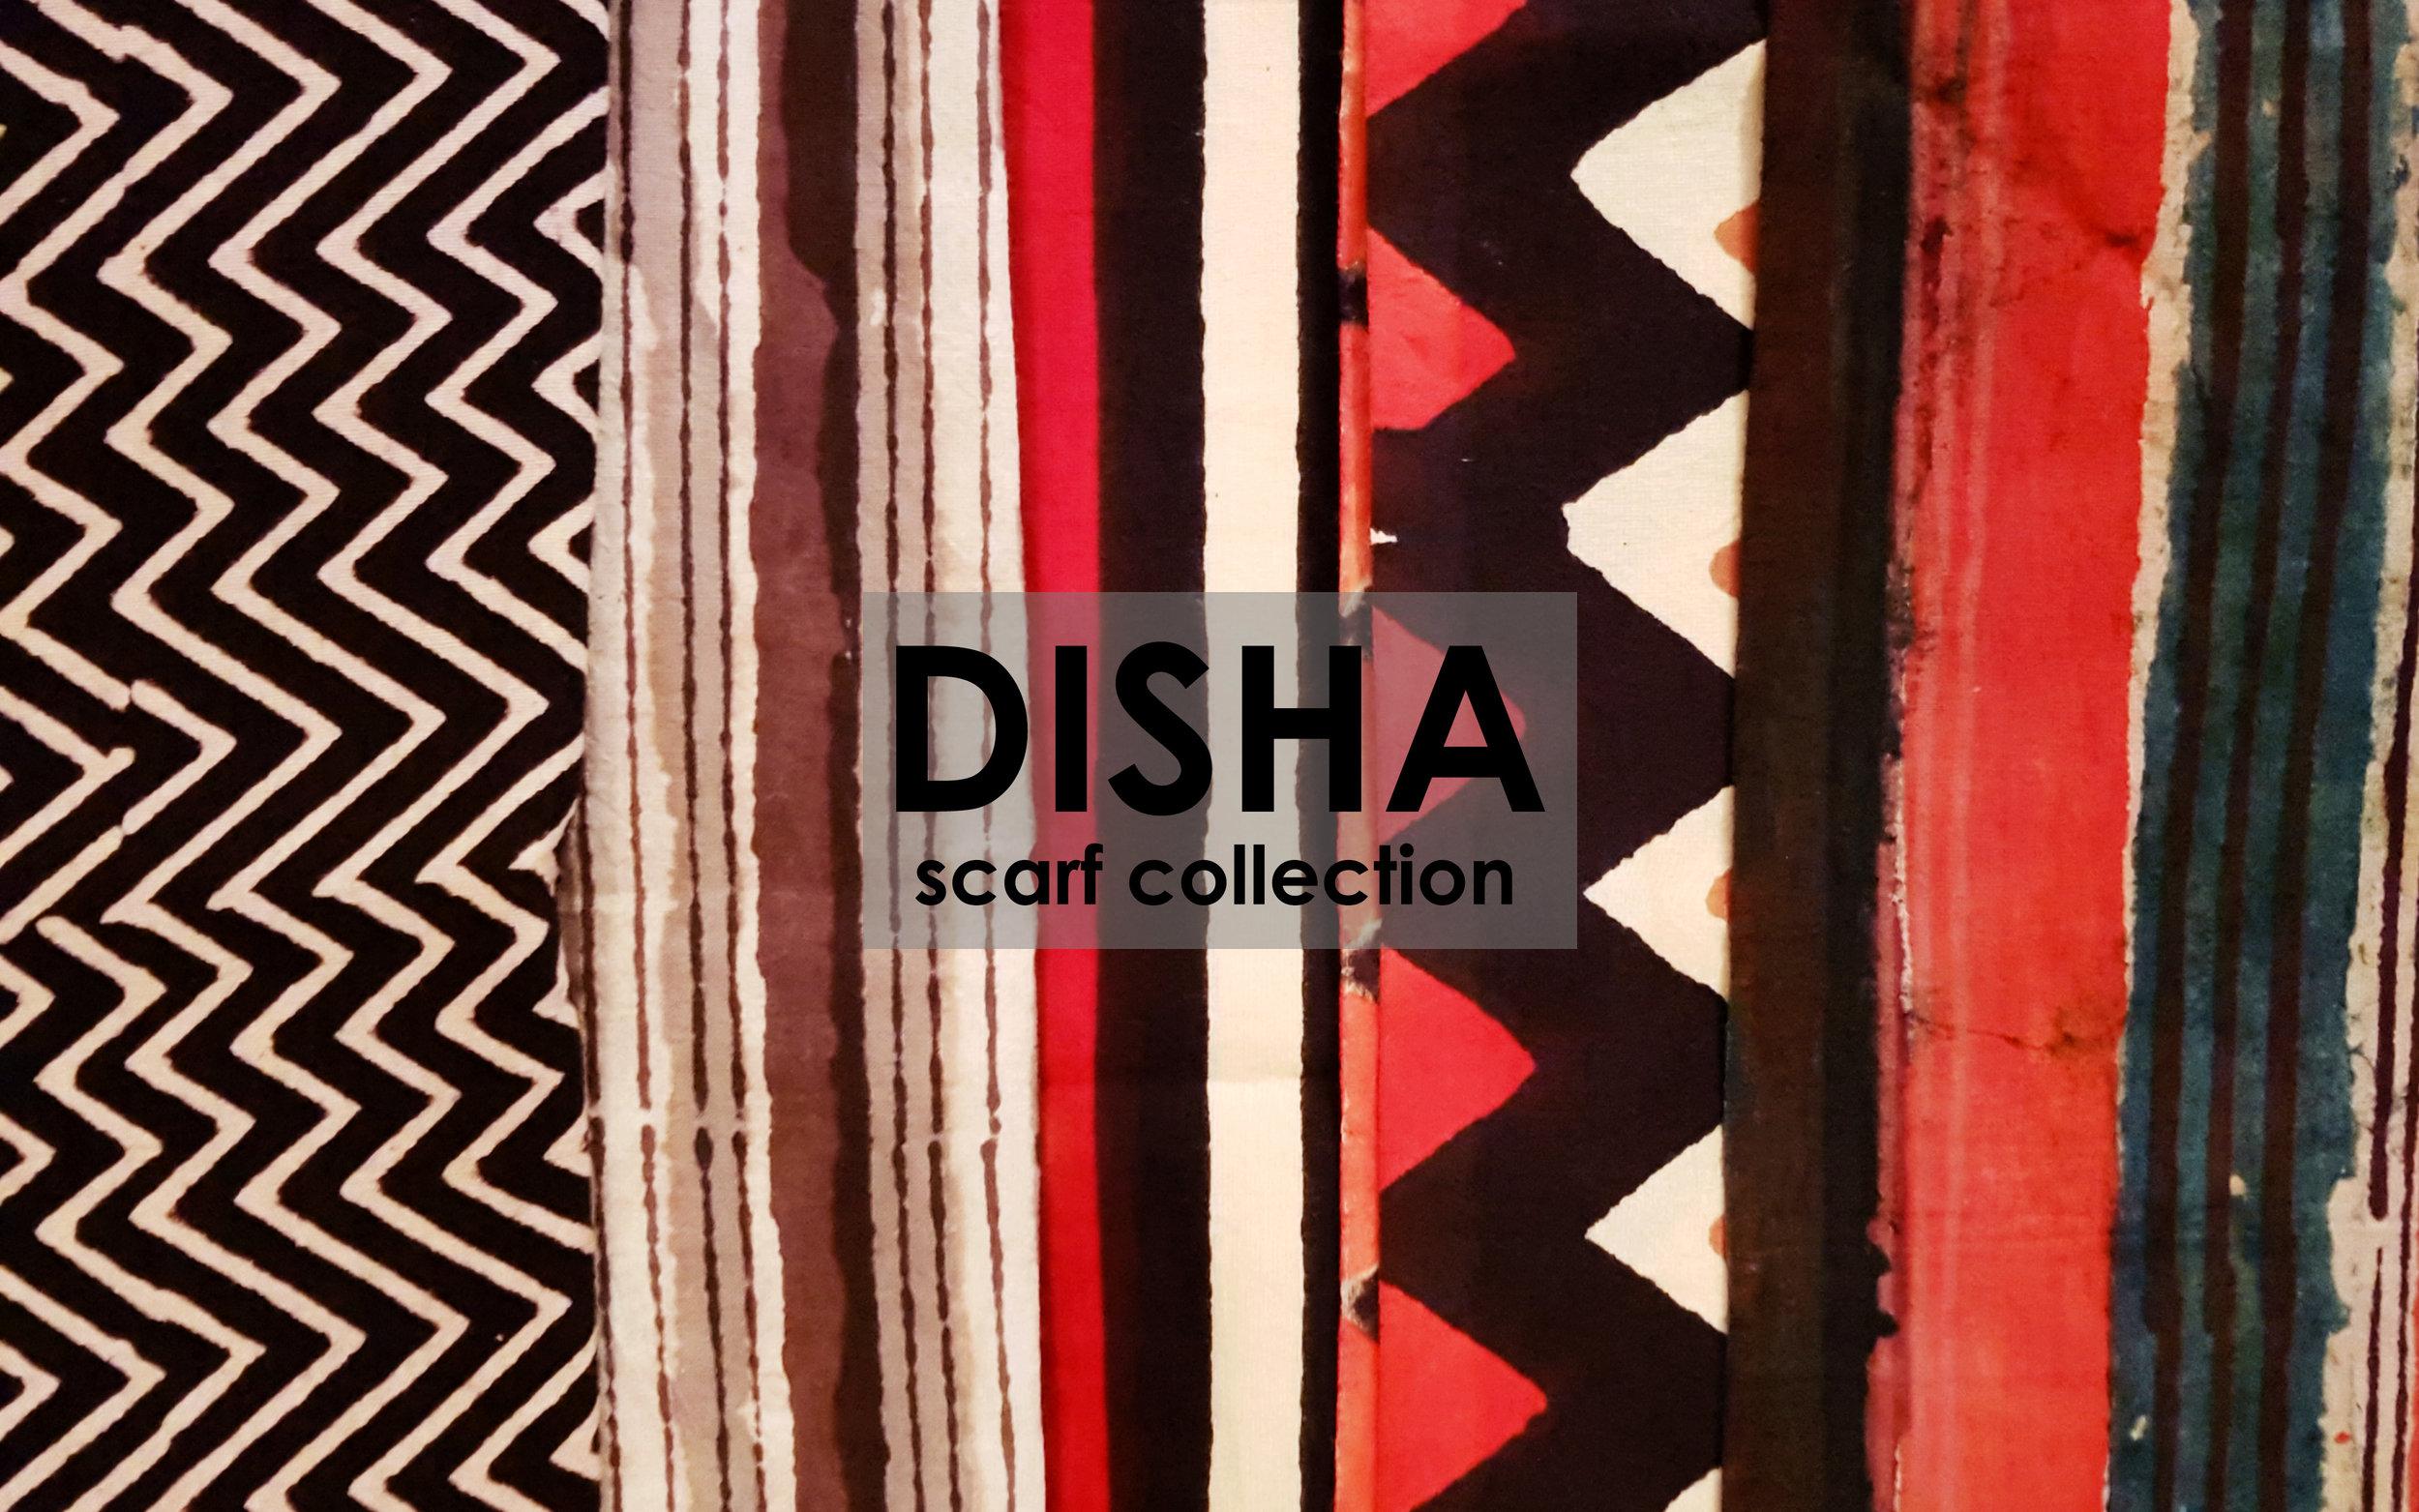 Disha header.jpg